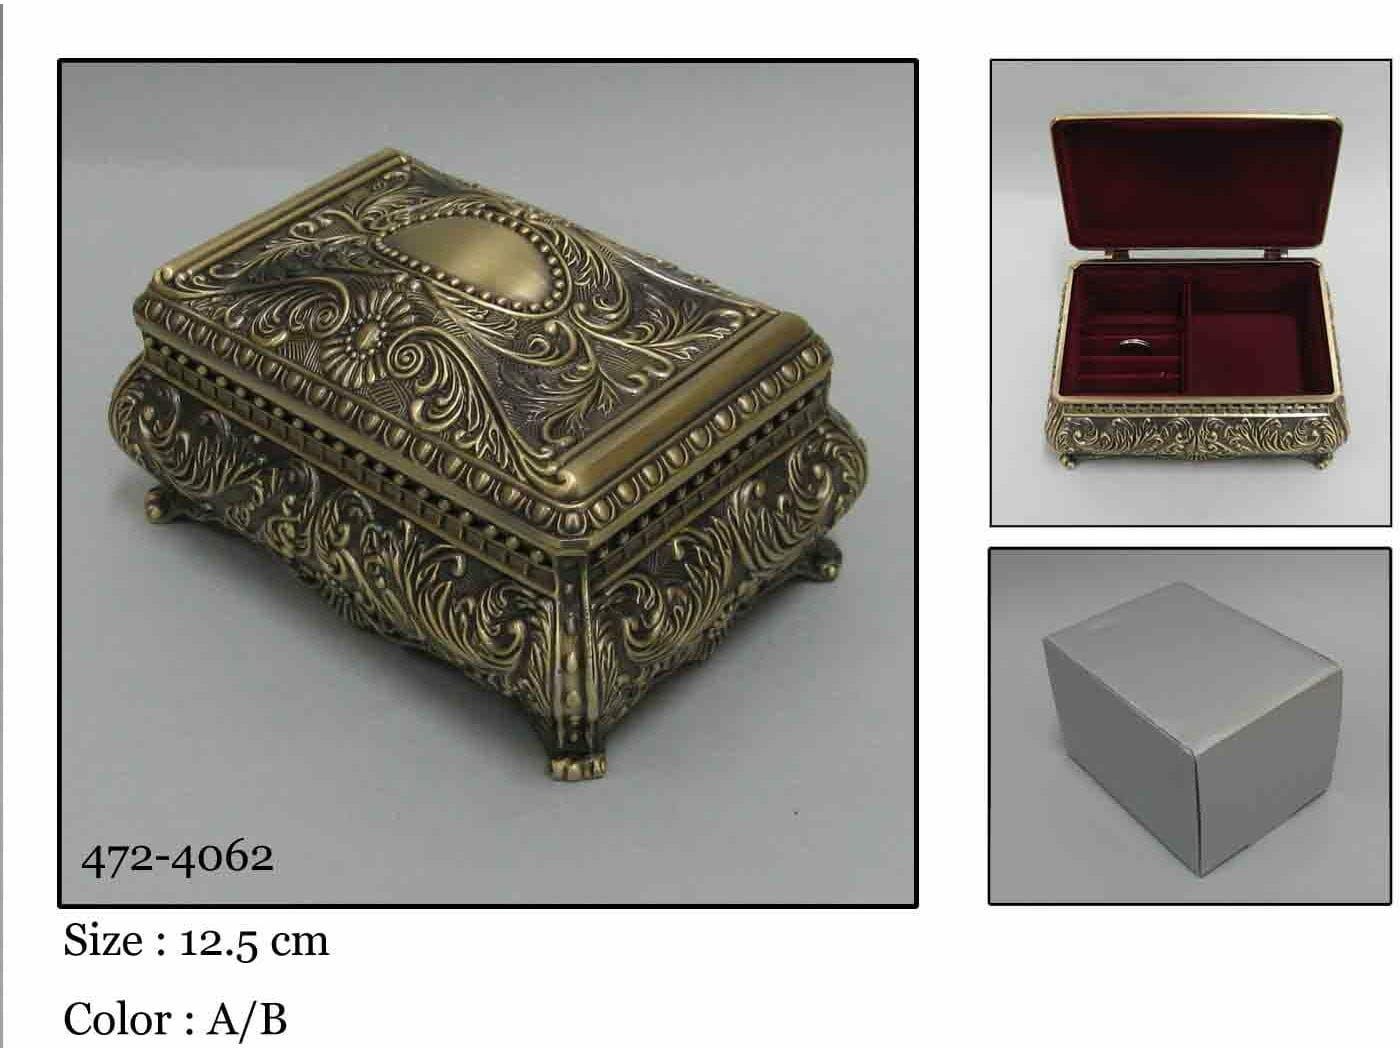 Kasetka, stare złoto, 11,5x7,5 cm